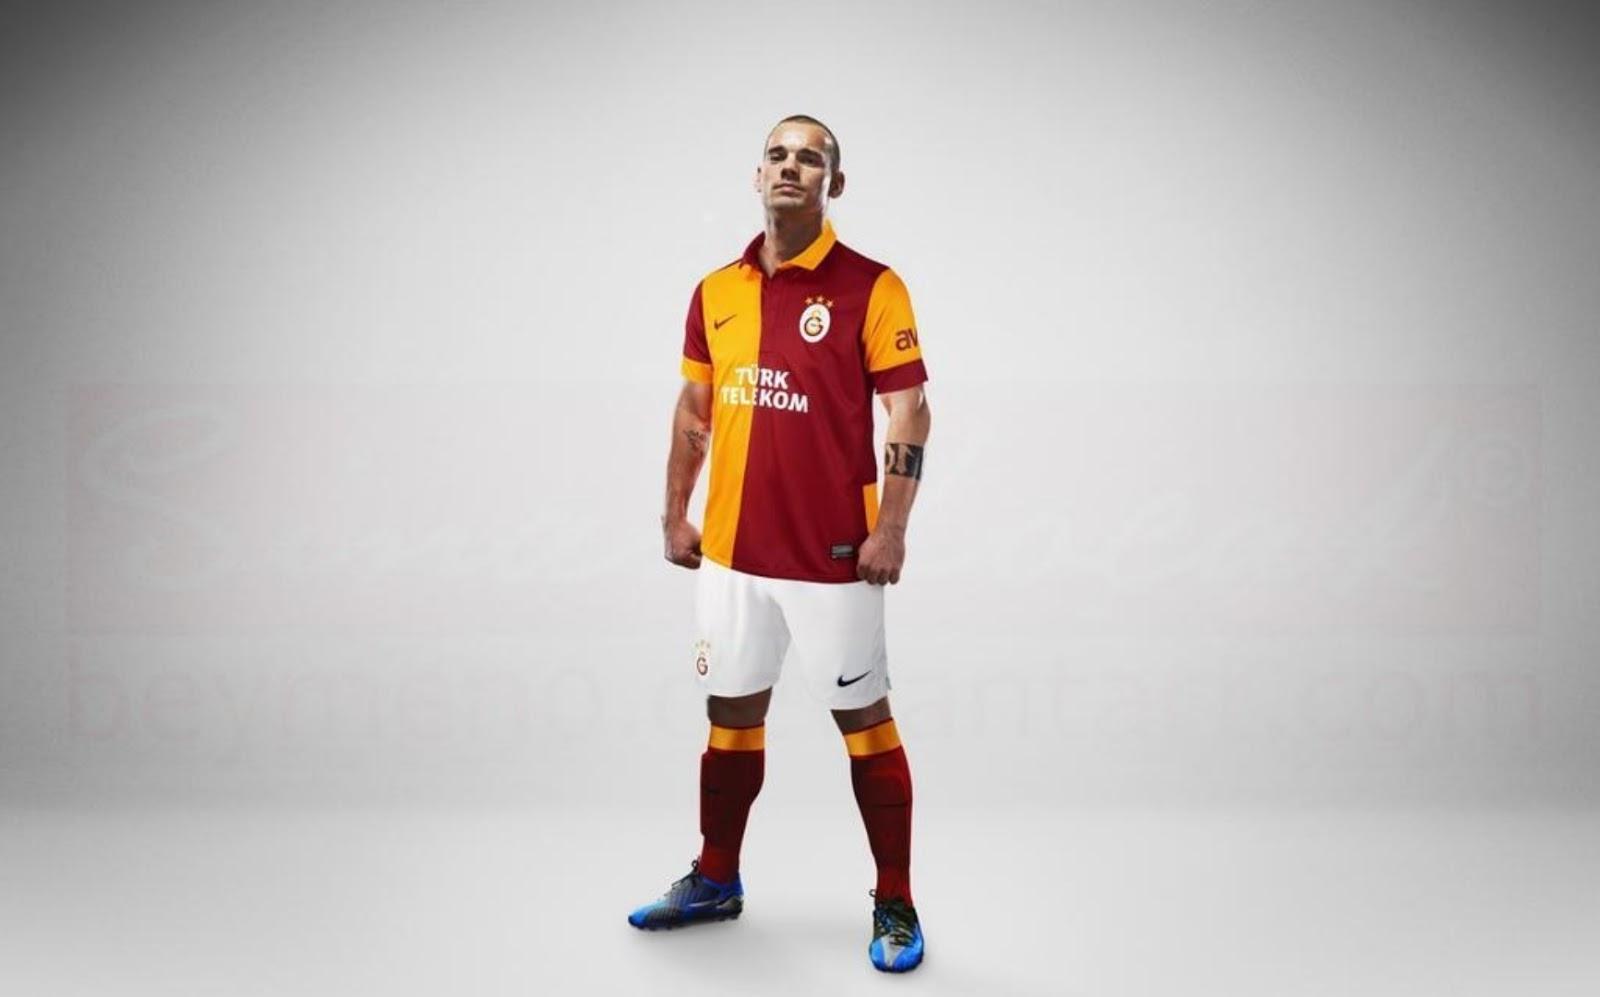 wesley+sneijder+galatasaray+resimleri+rooteto+7 Wesley Sneijder Galatasaray HD Resimleri